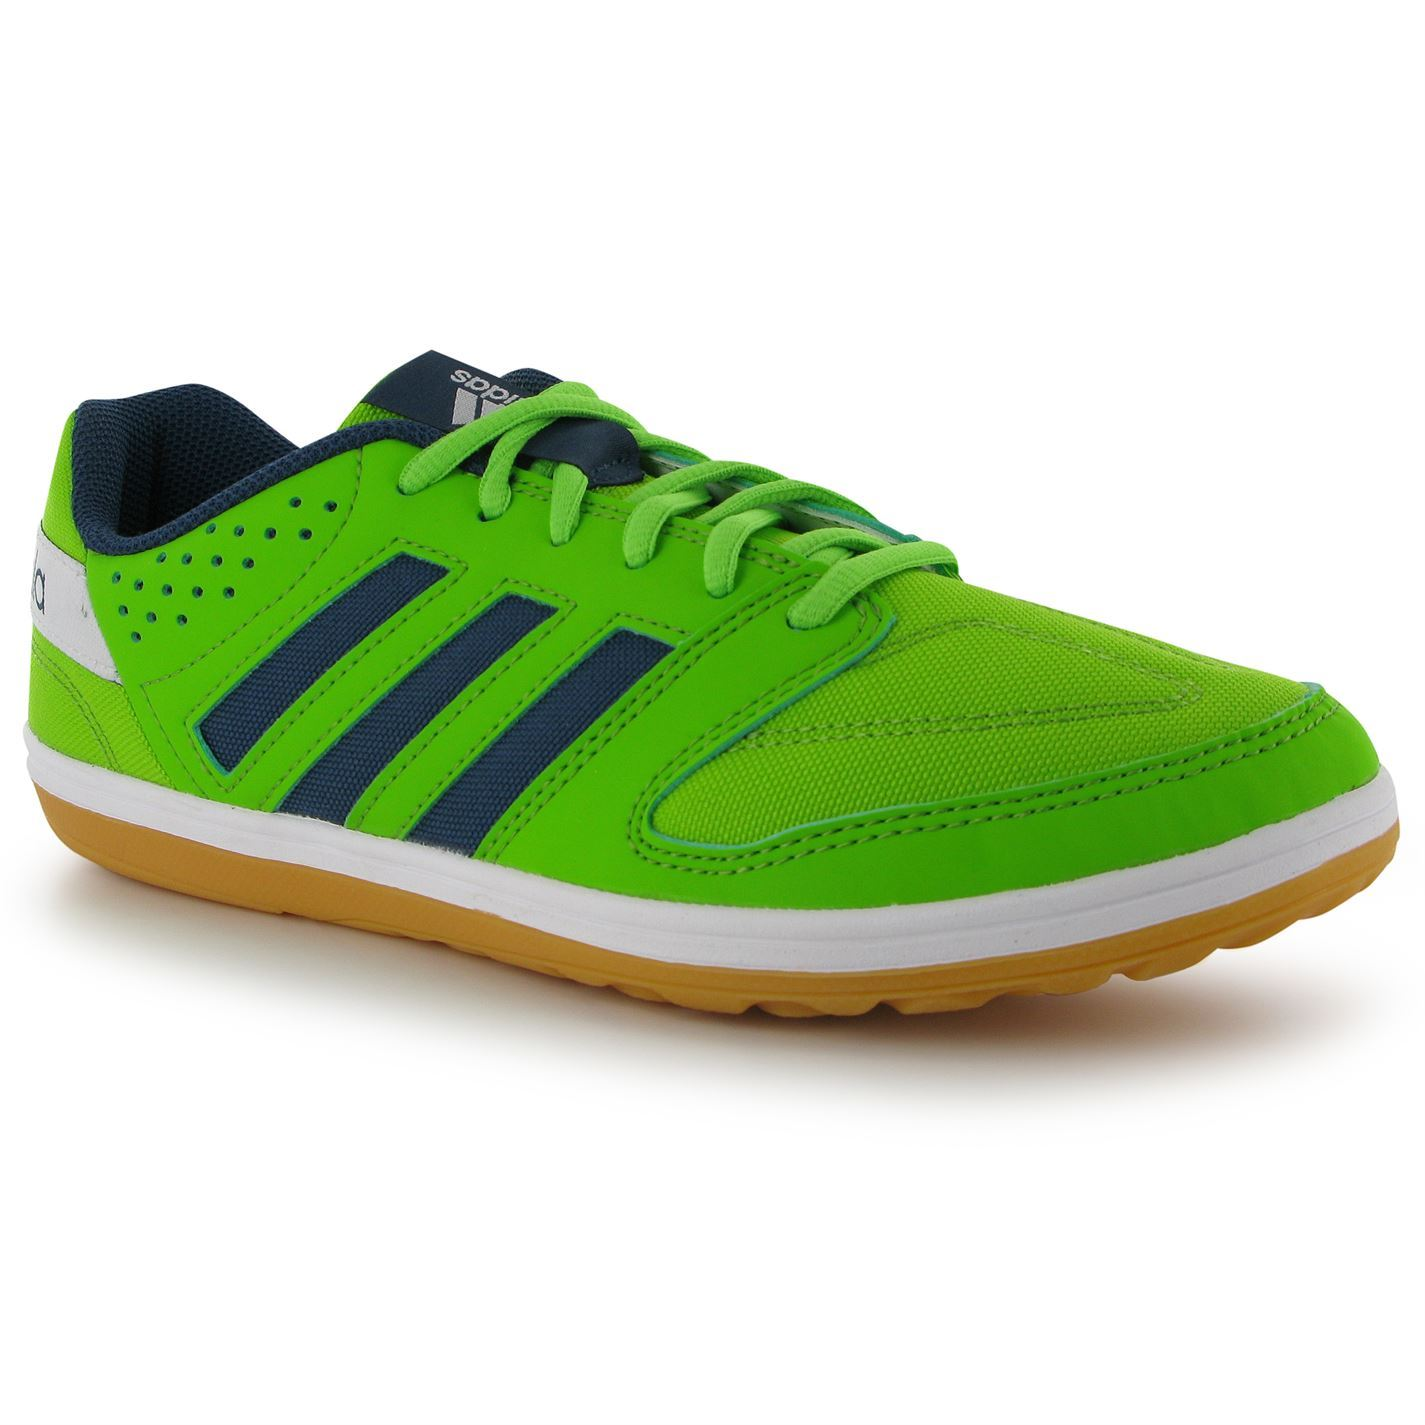 Adidas Futsal Janeirinha